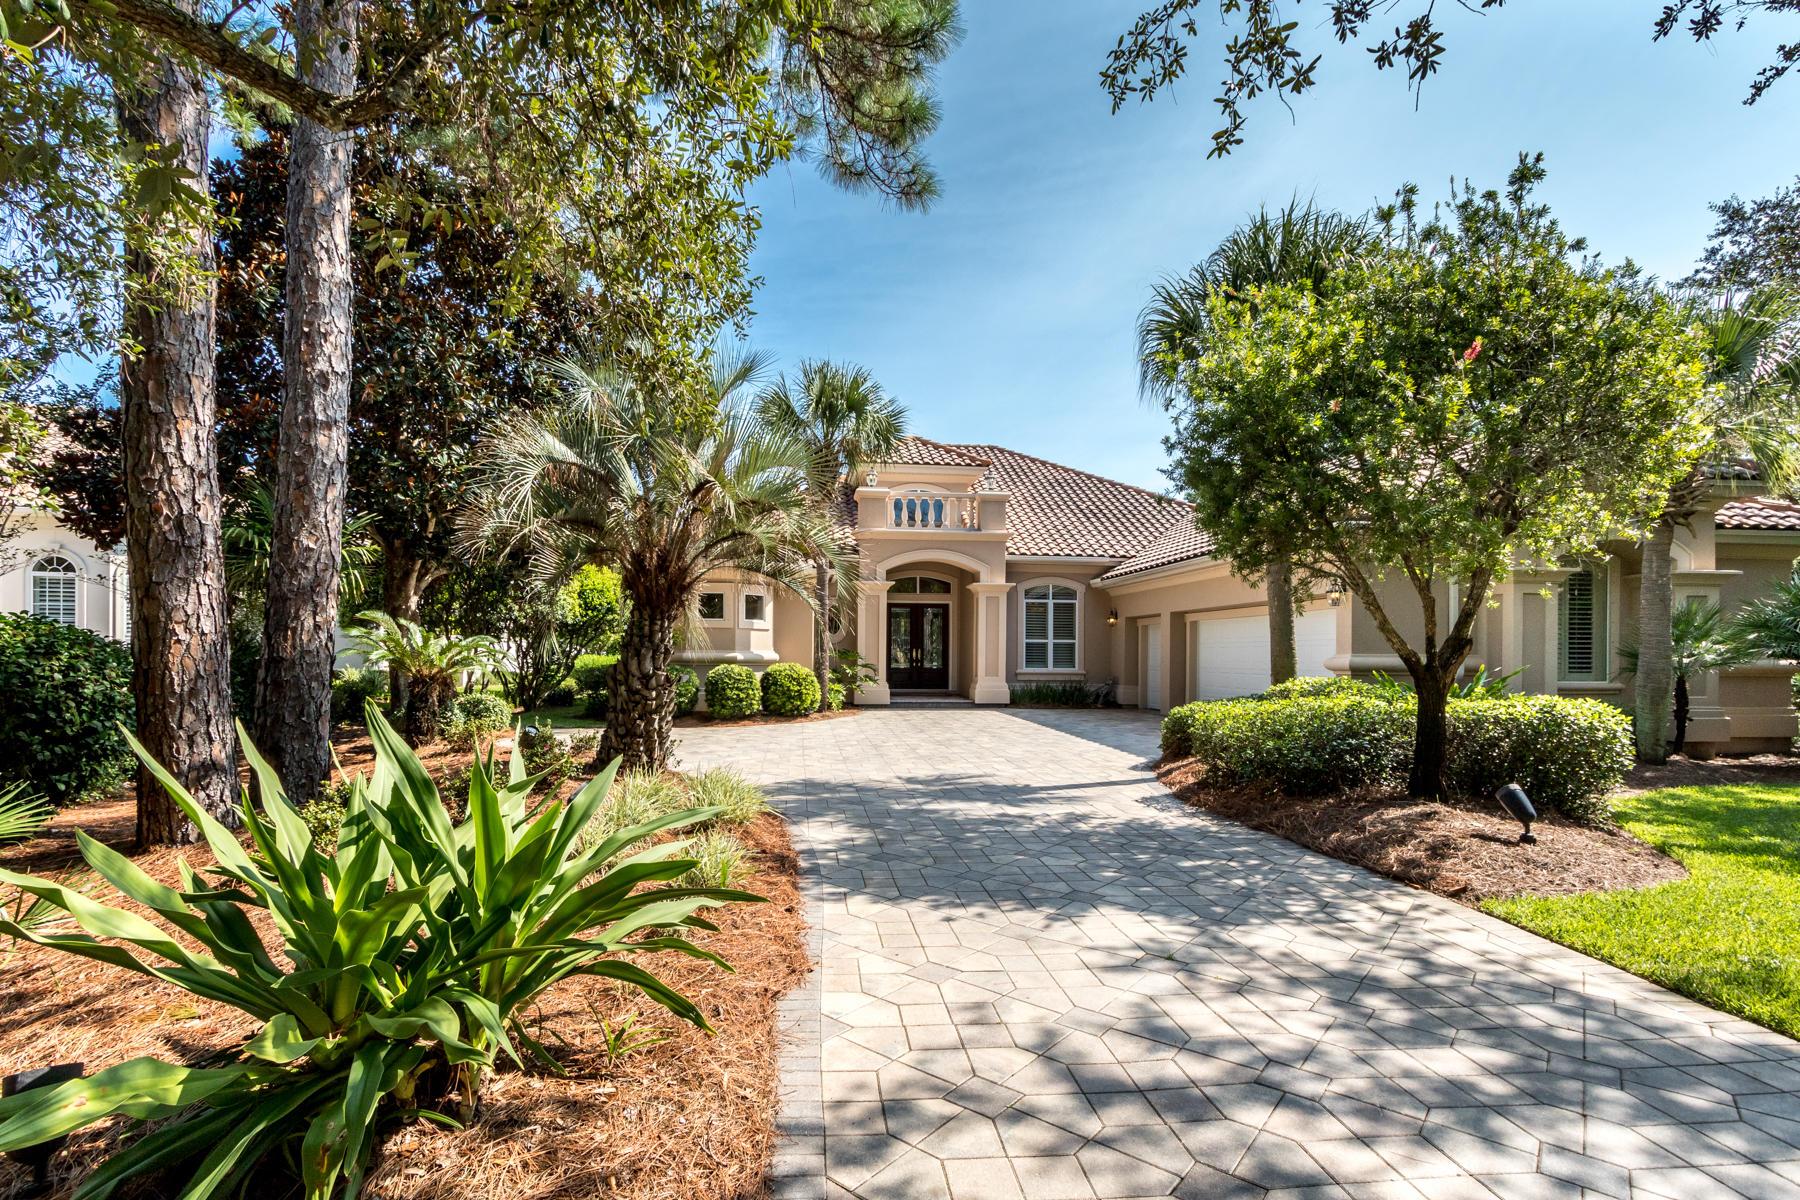 Photo of home for sale at 431 Captains, Destin FL